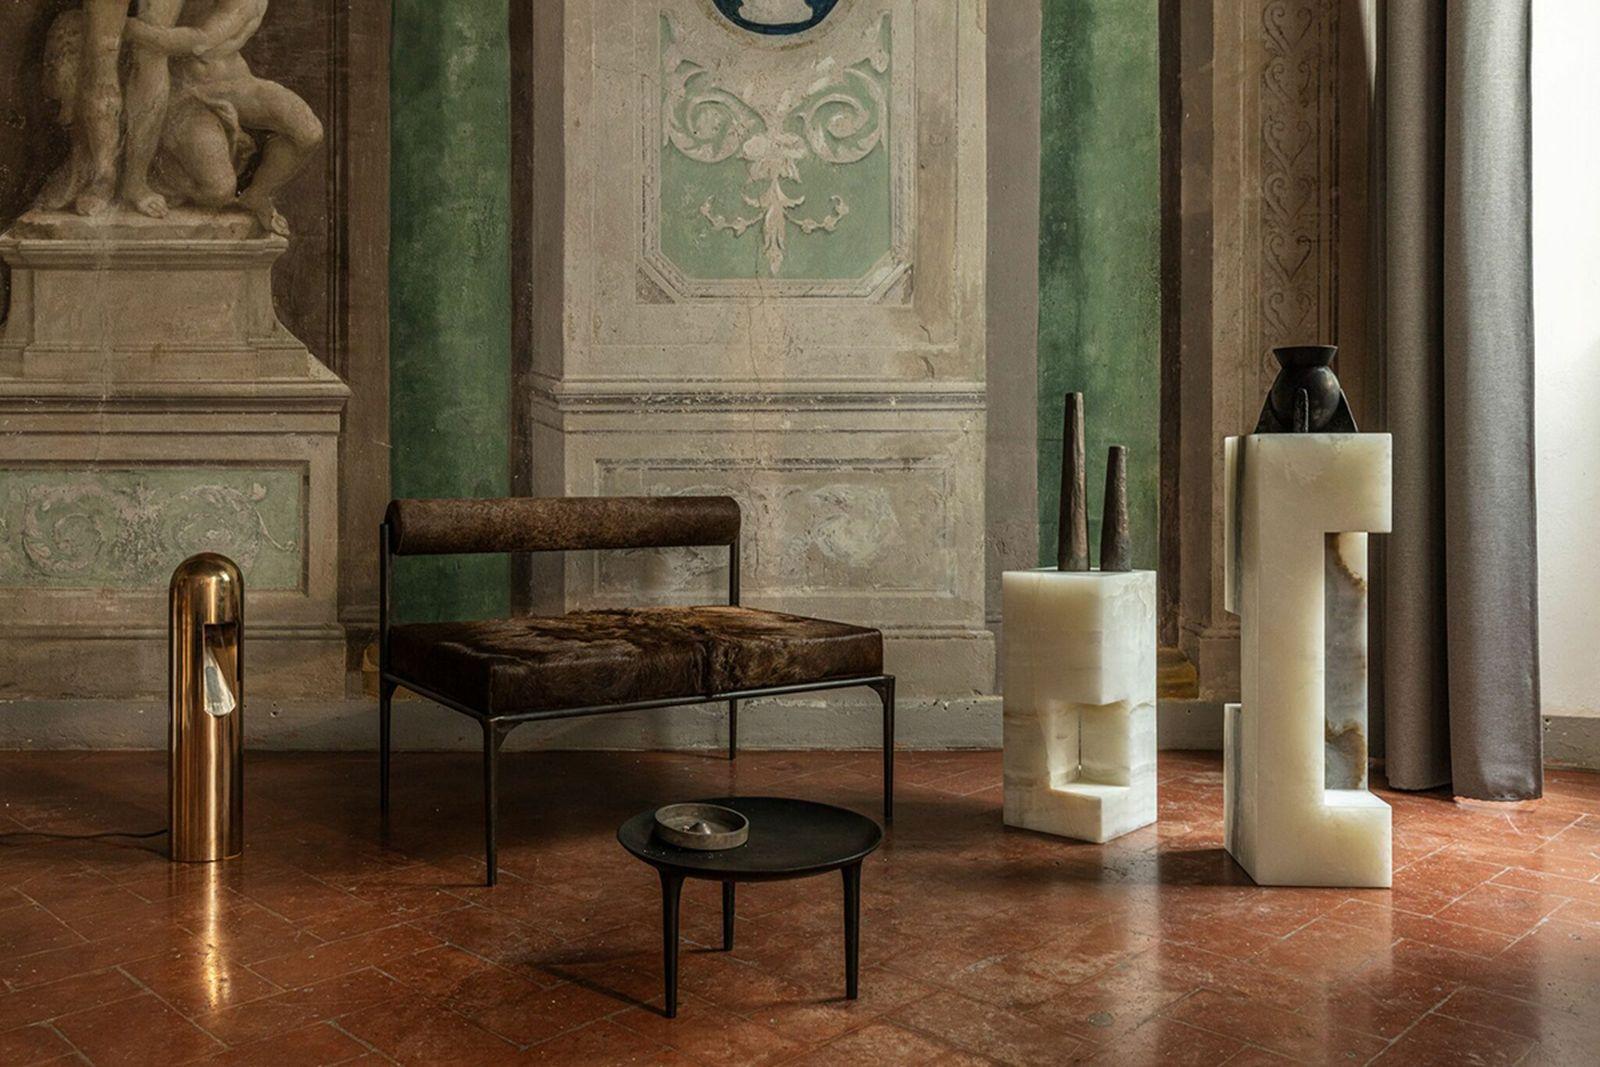 rick-owens-furniture-exhibit (3)